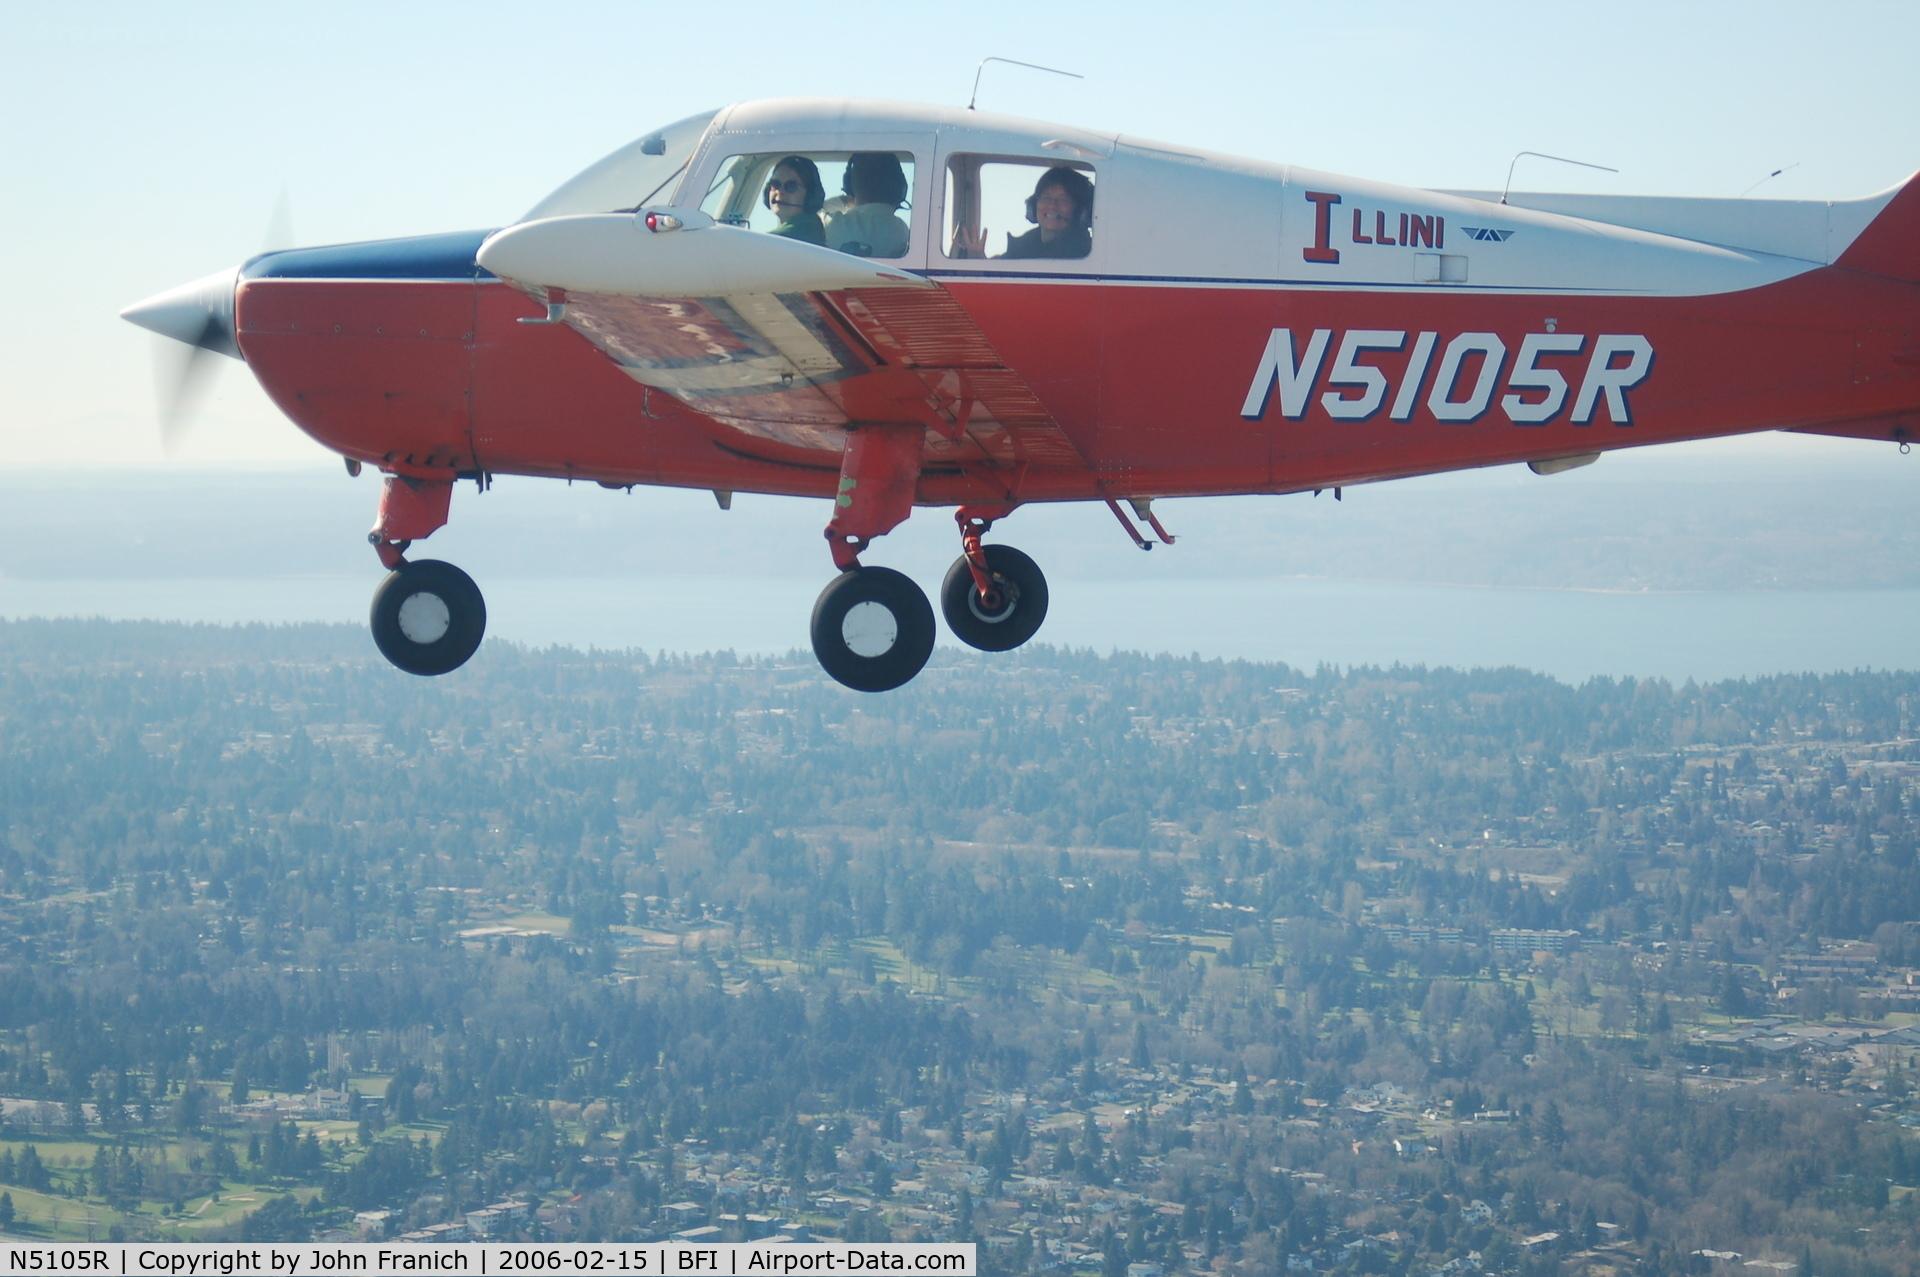 N5105R, 1974 Beech B19 Sport 150 C/N MB-639, Flight of 2 transition BFI